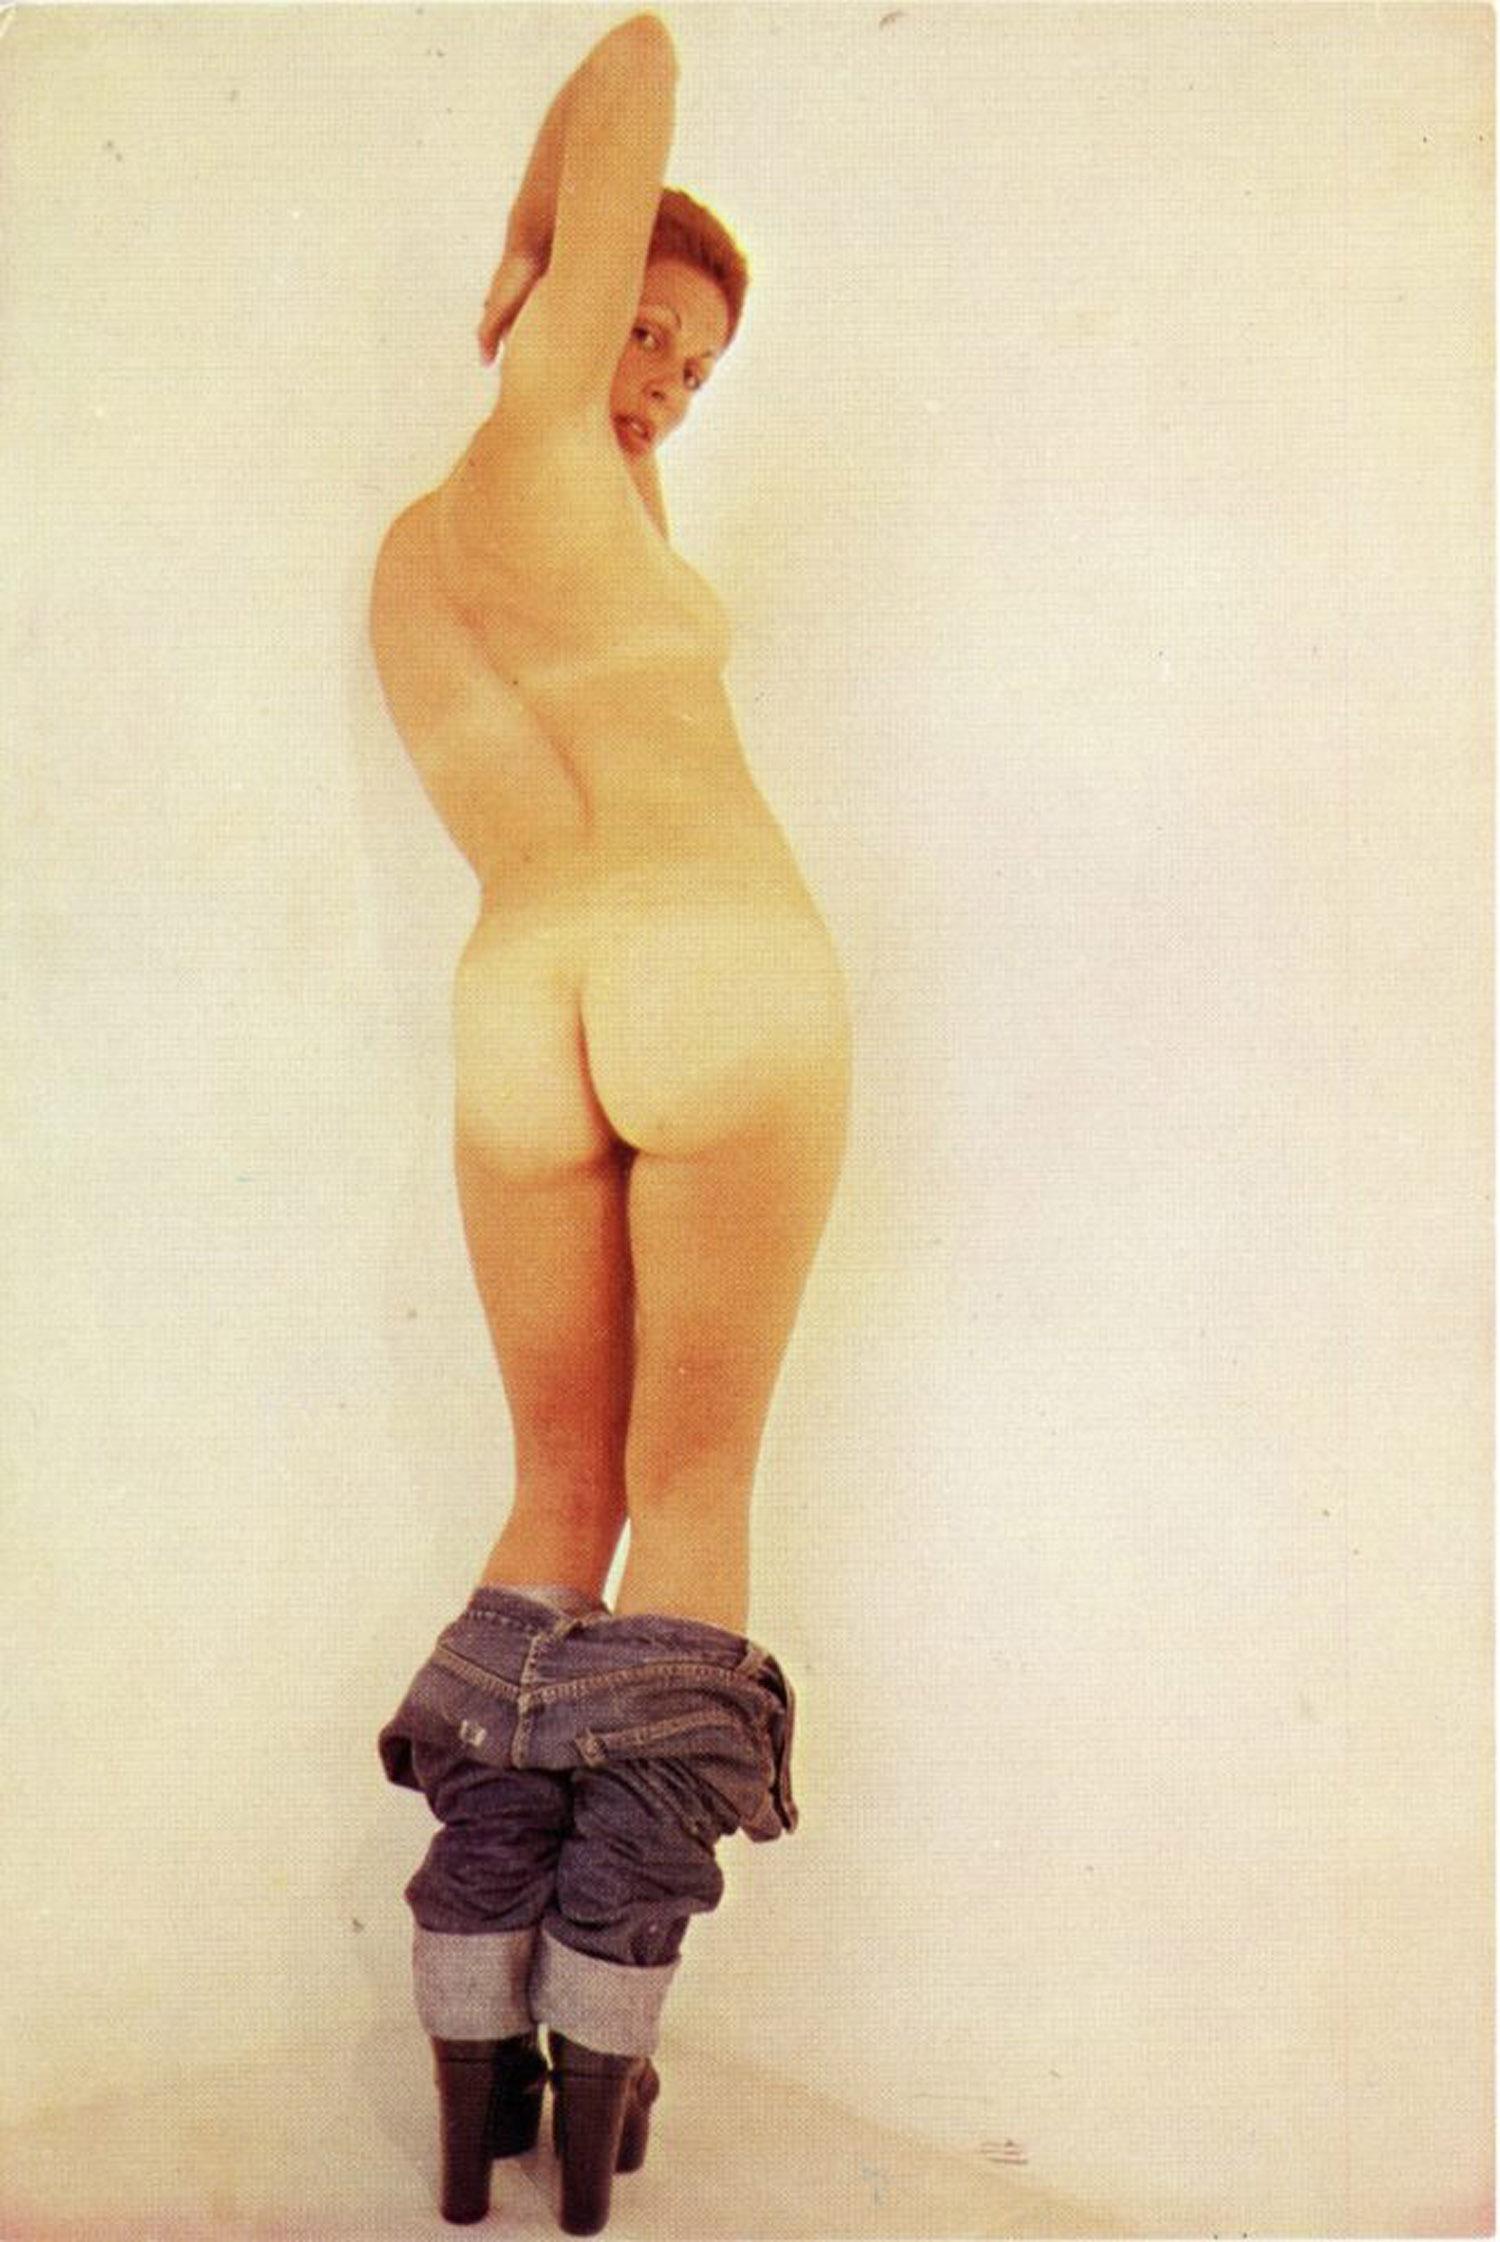 Paula Cooper Gallery, Lynda Benglis, Metallized Knots, Card, 1974